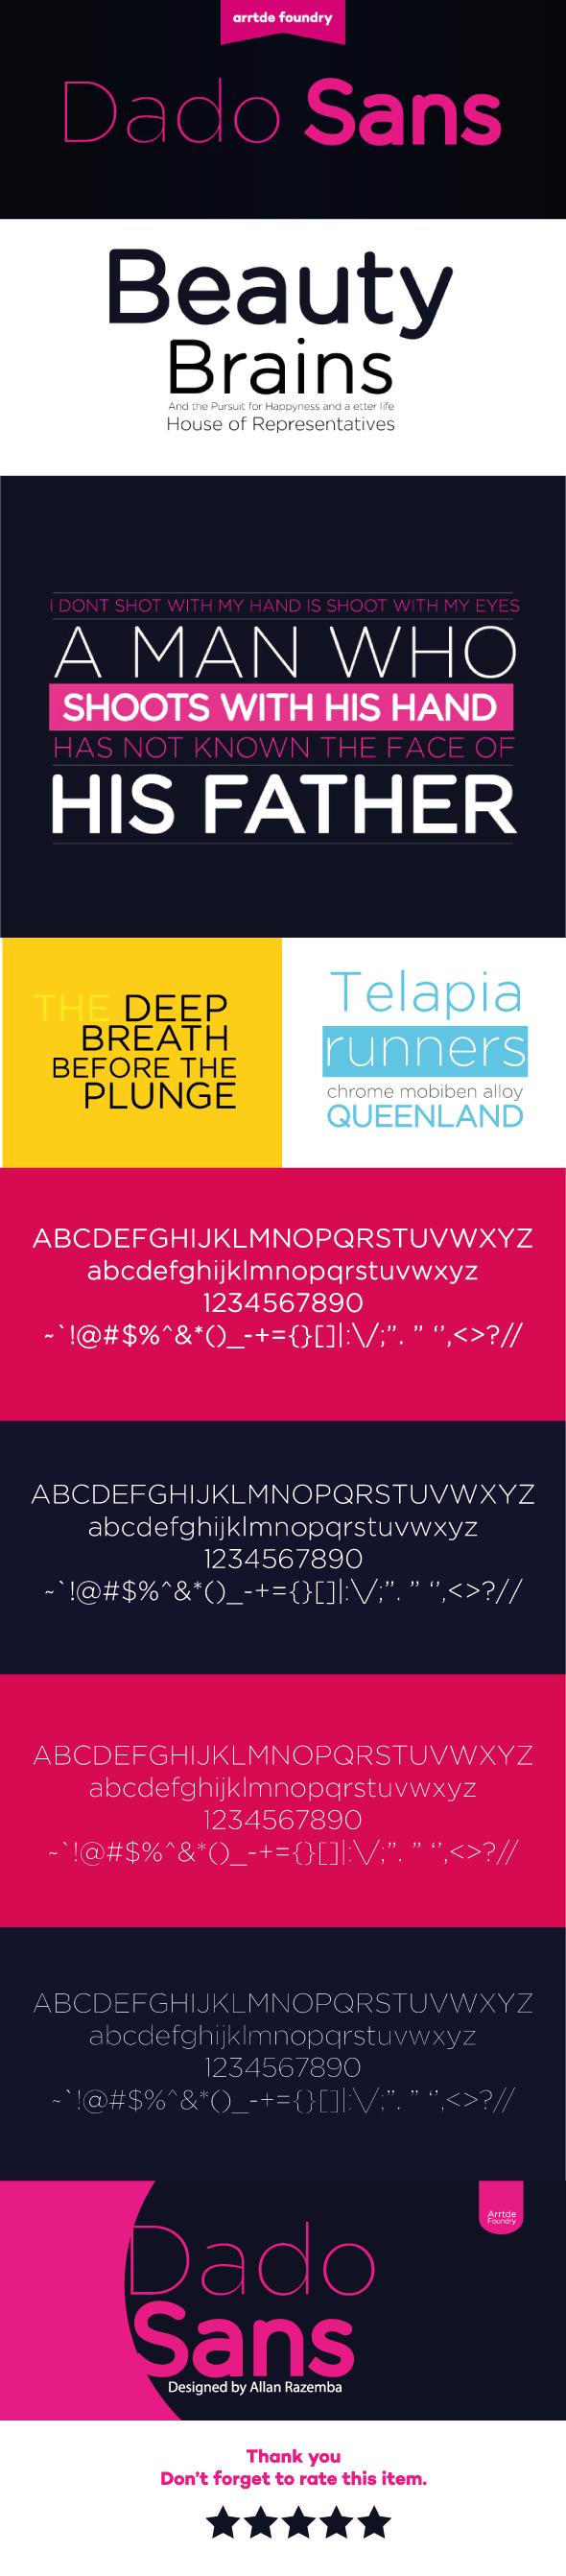 Dado Sans Typeface - Sans-Serif Fonts